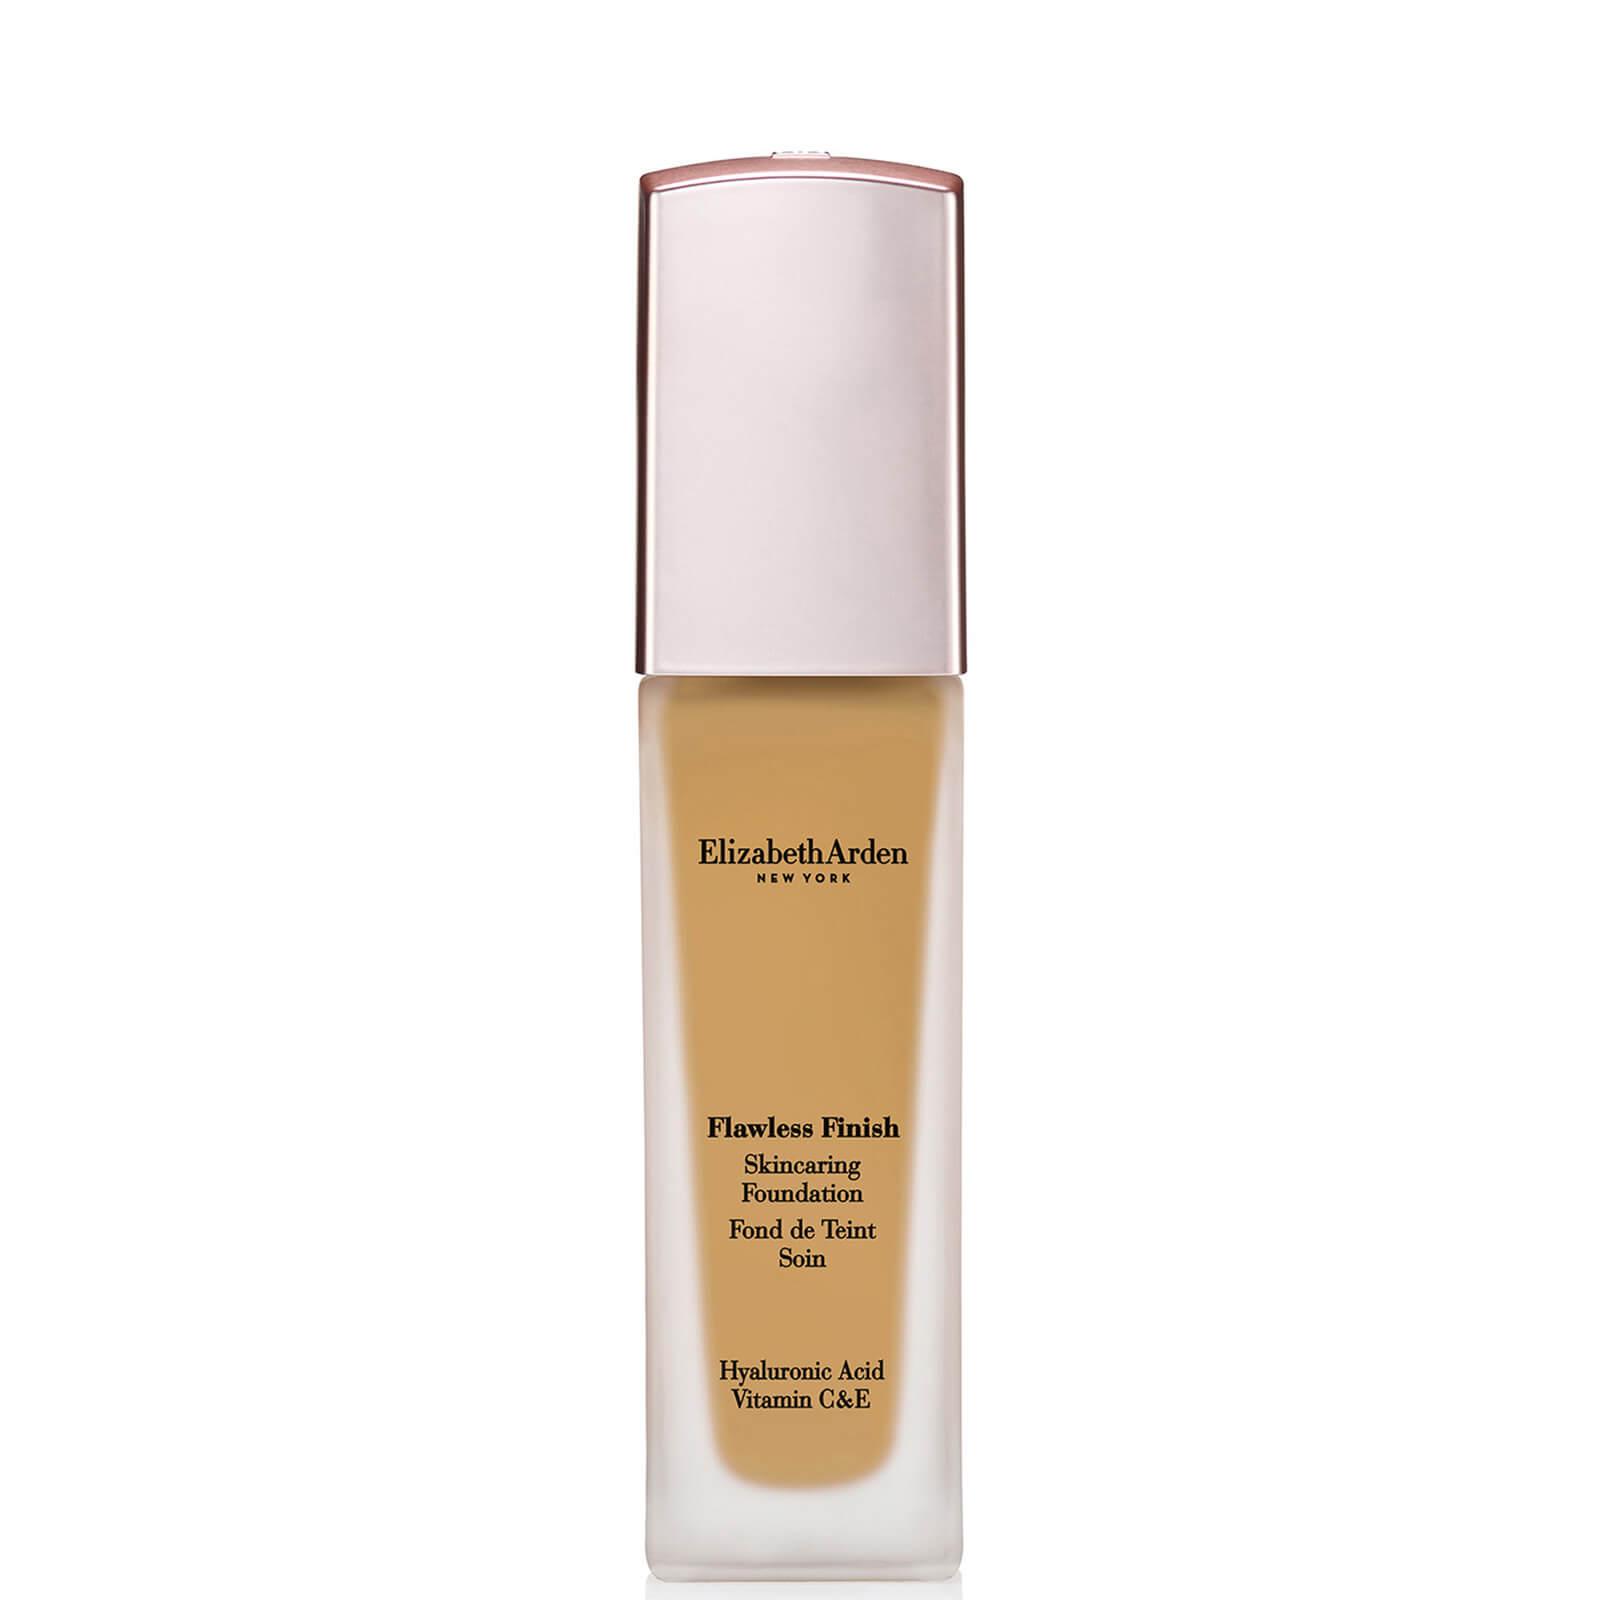 Купить Elizabeth Arden Flawless Finish Skincaring Foundation 30ml (Various Shades) - 450N